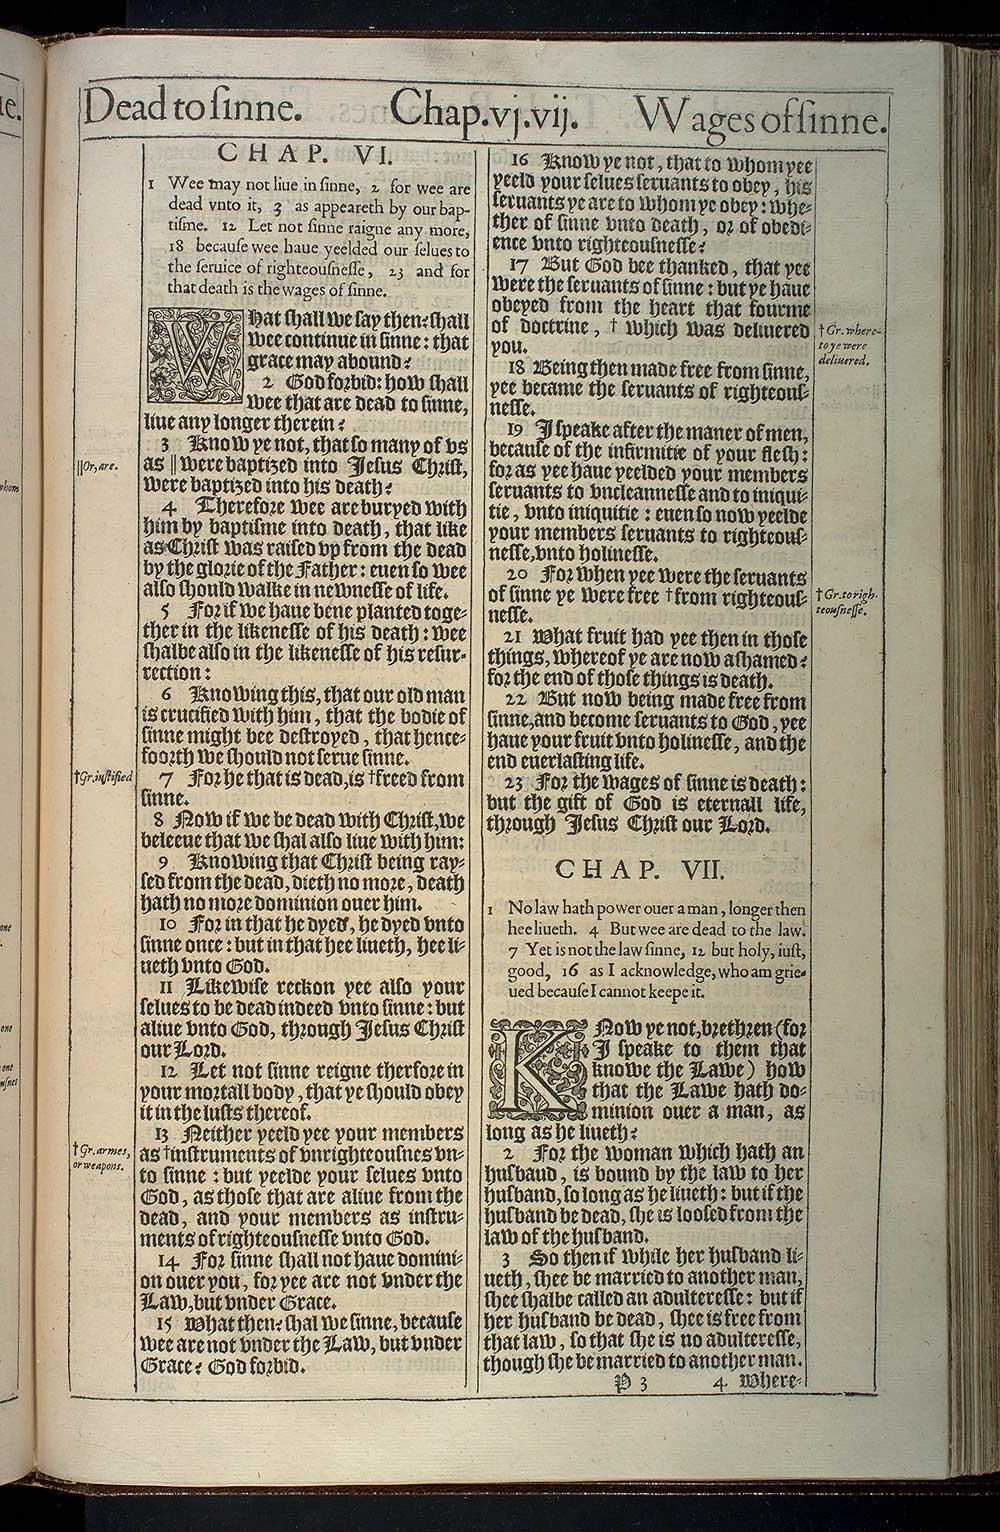 Romans Chapter 7 Original 1611 Bible Scan